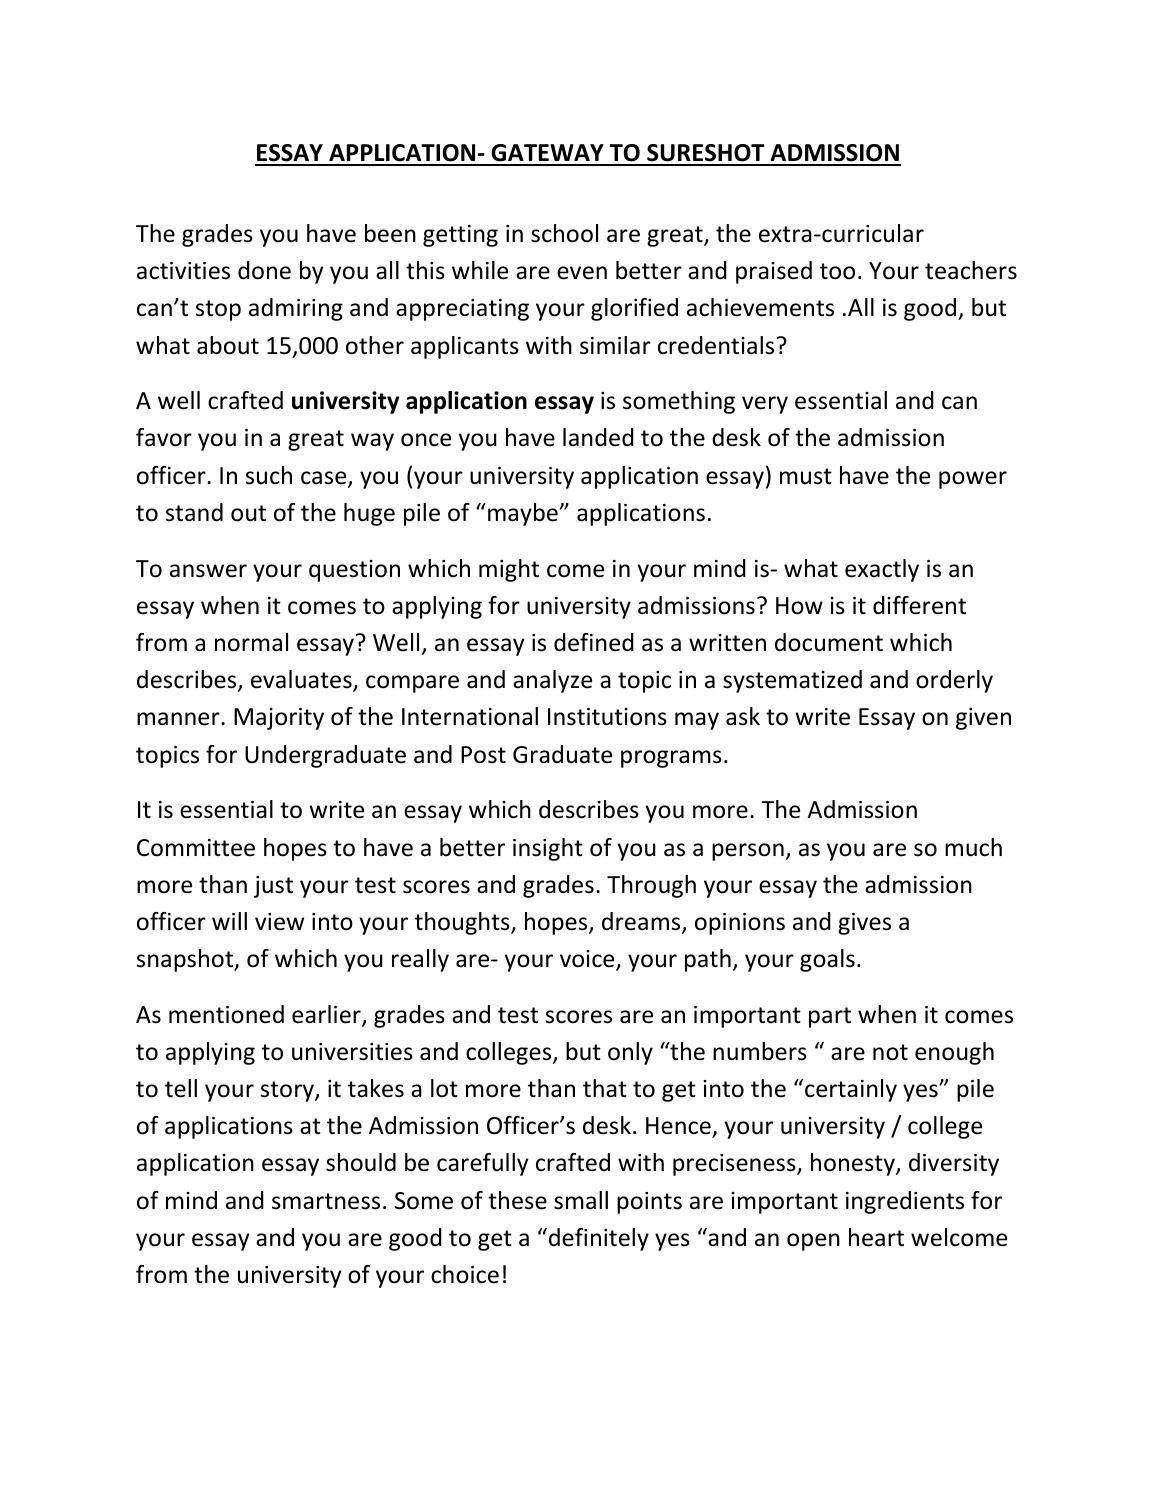 Essay Application Gateway To Sureshot Admission